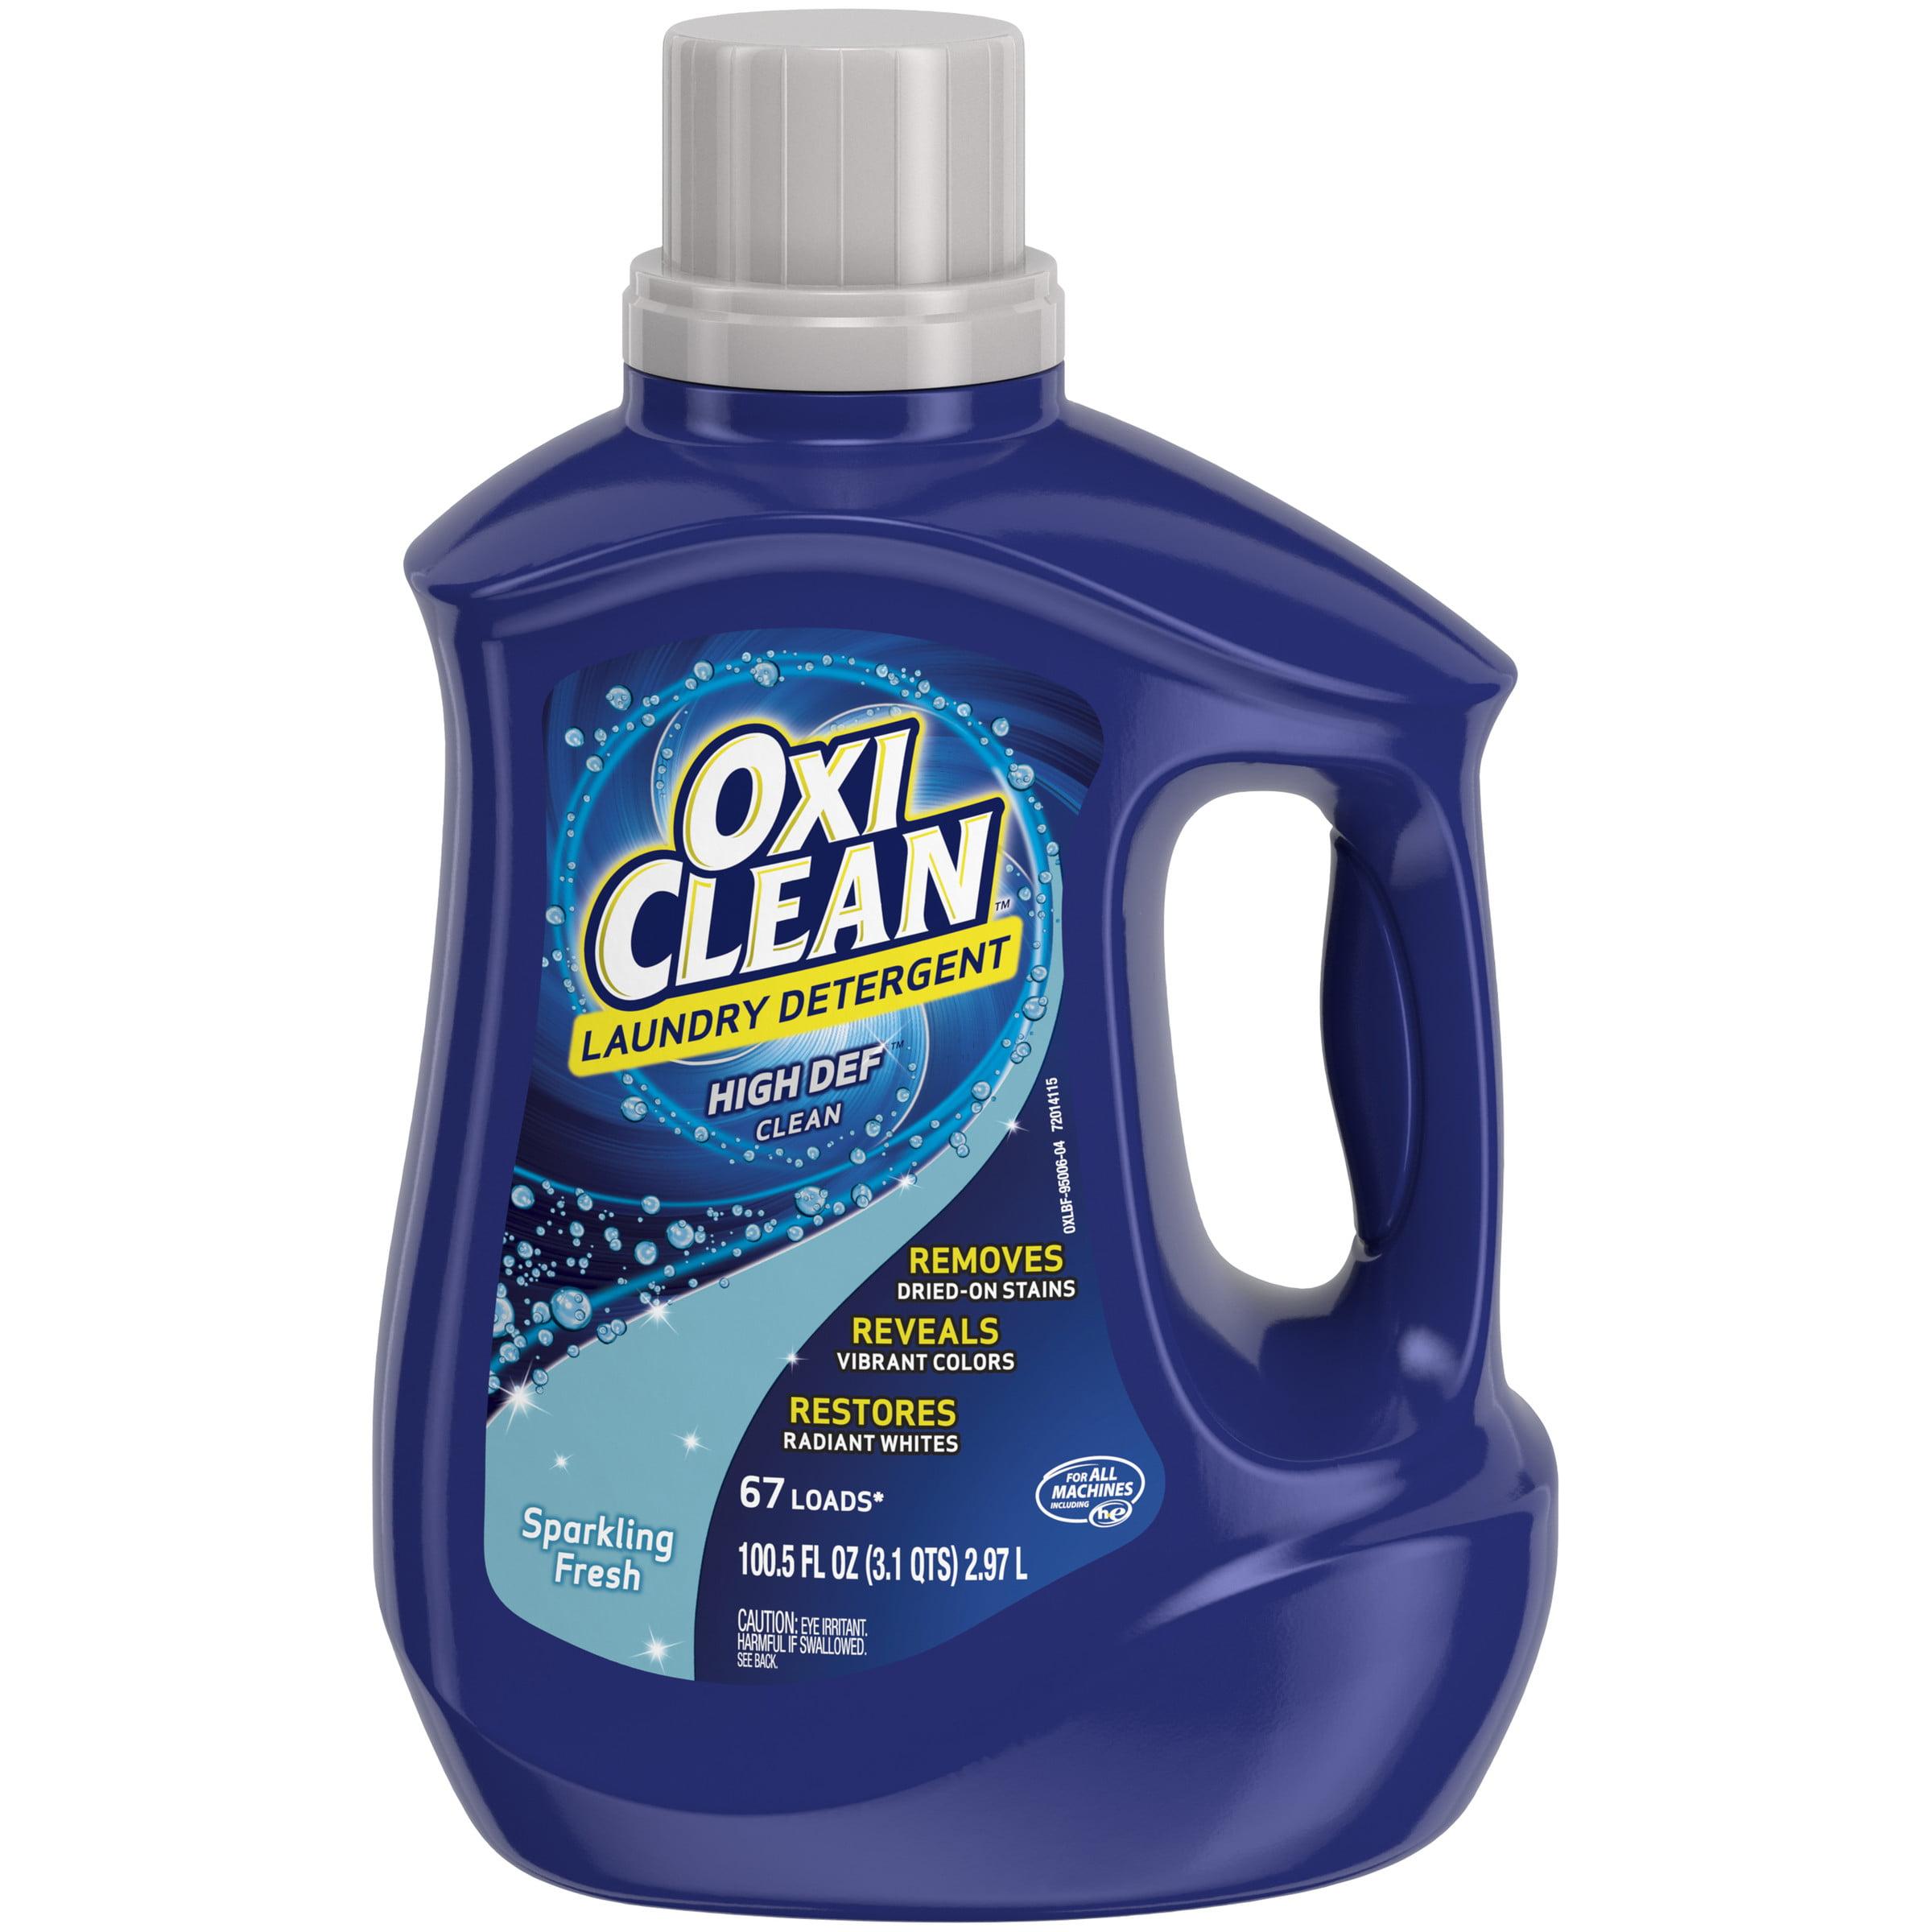 OxiClean Liquid Laundry Detergent, Sparkling Fresh Scent, 100.5 oz.